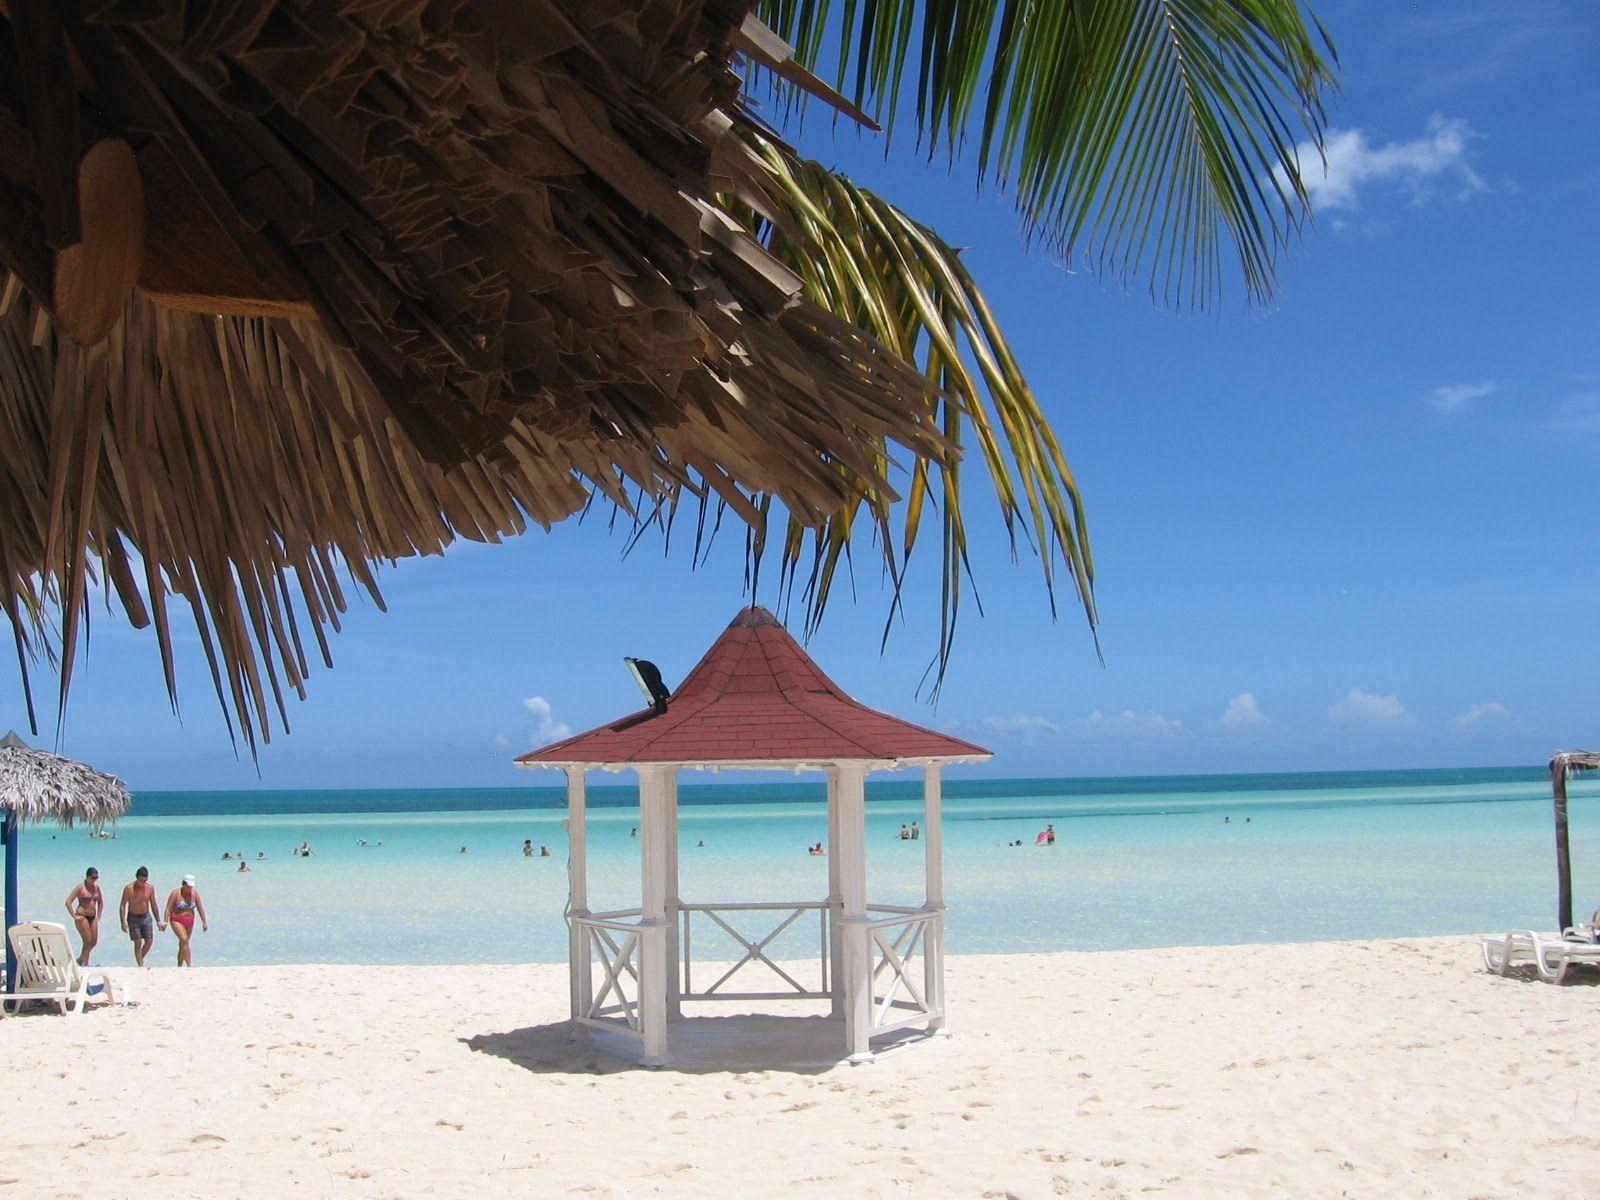 Memories Caribe Beach Resort Cayo Coco Cuba Tour Pascal Tanguay